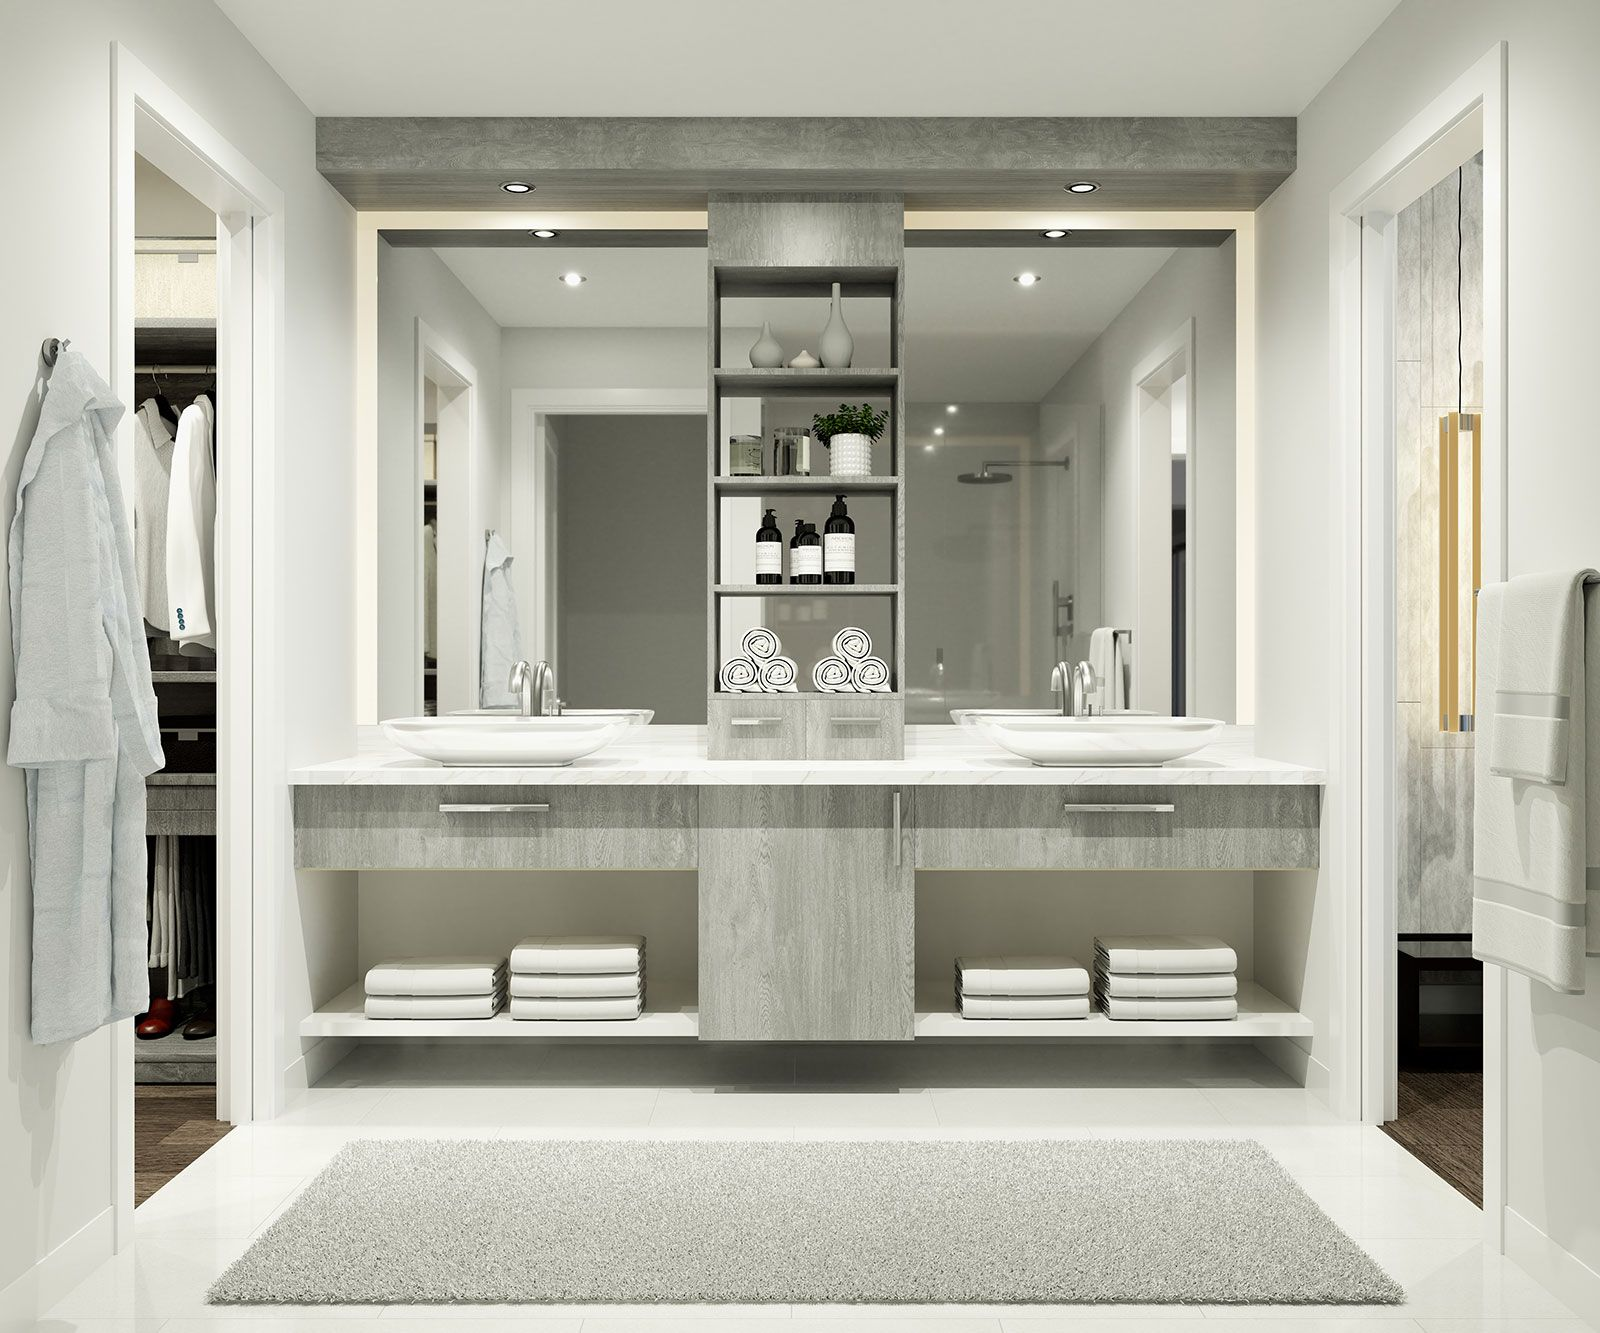 Residence 2:Interior